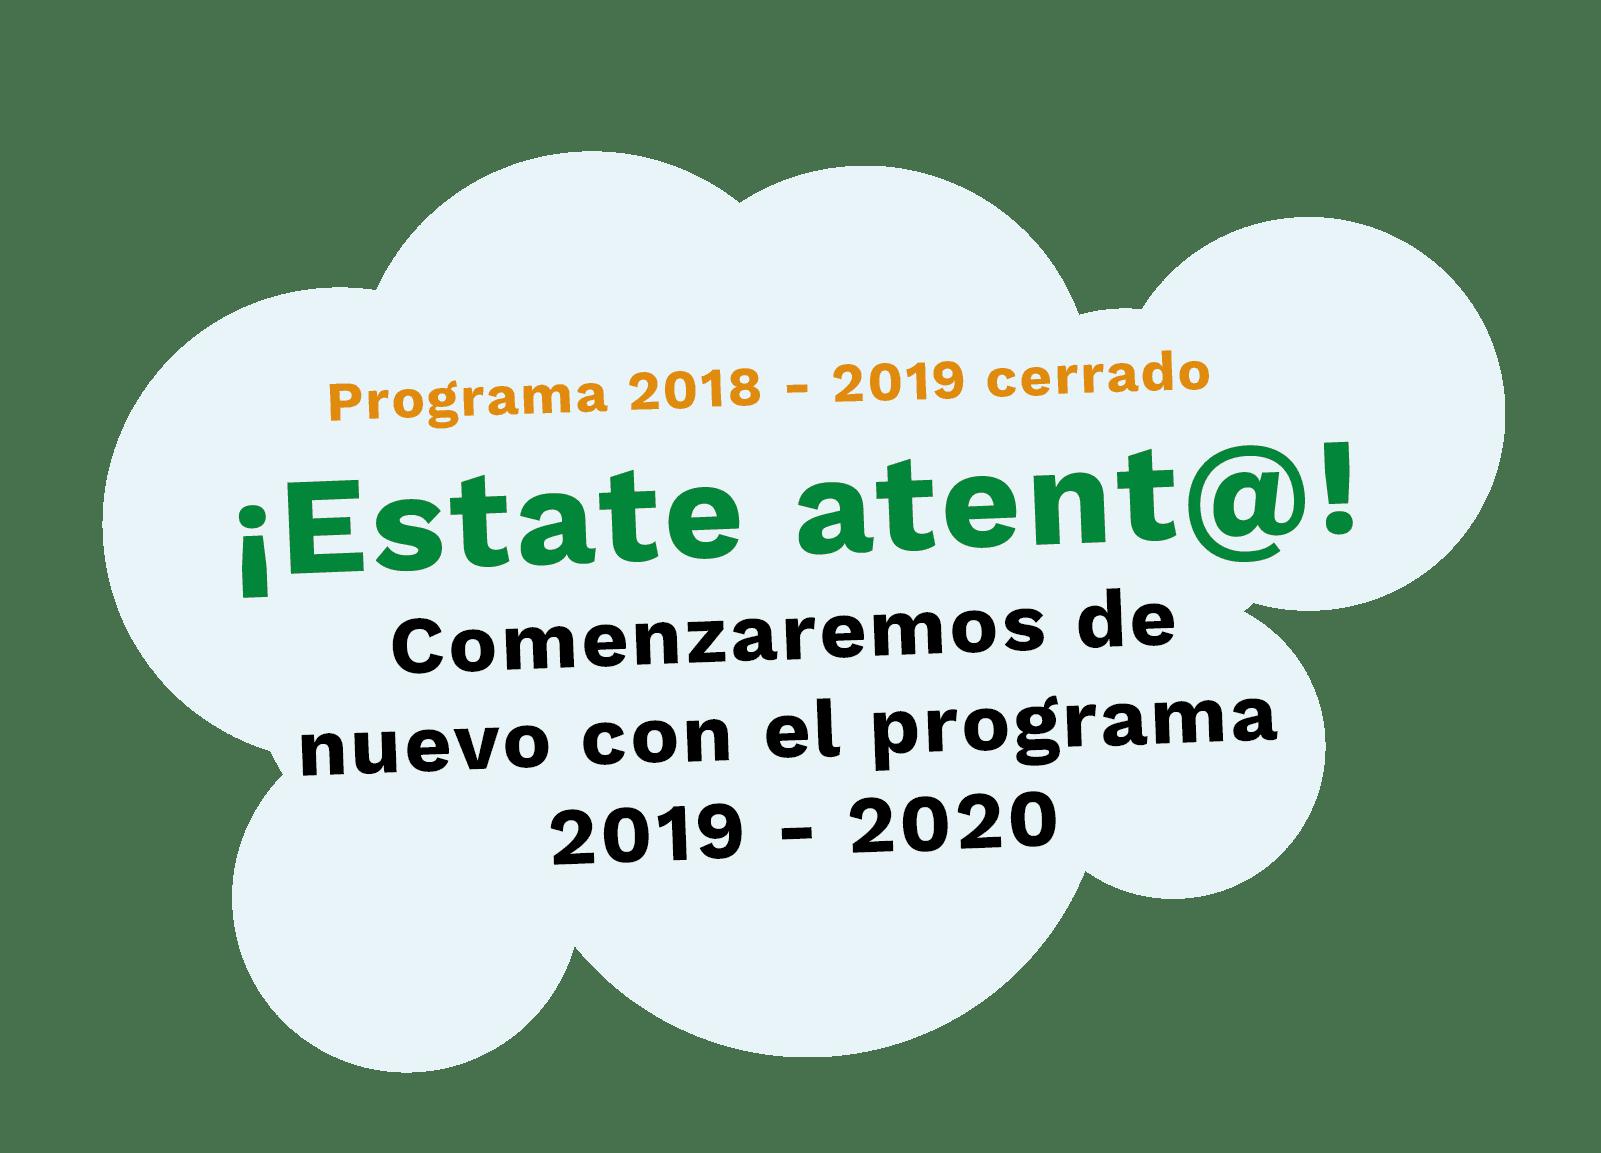 Programa 2018-2019 cerrado